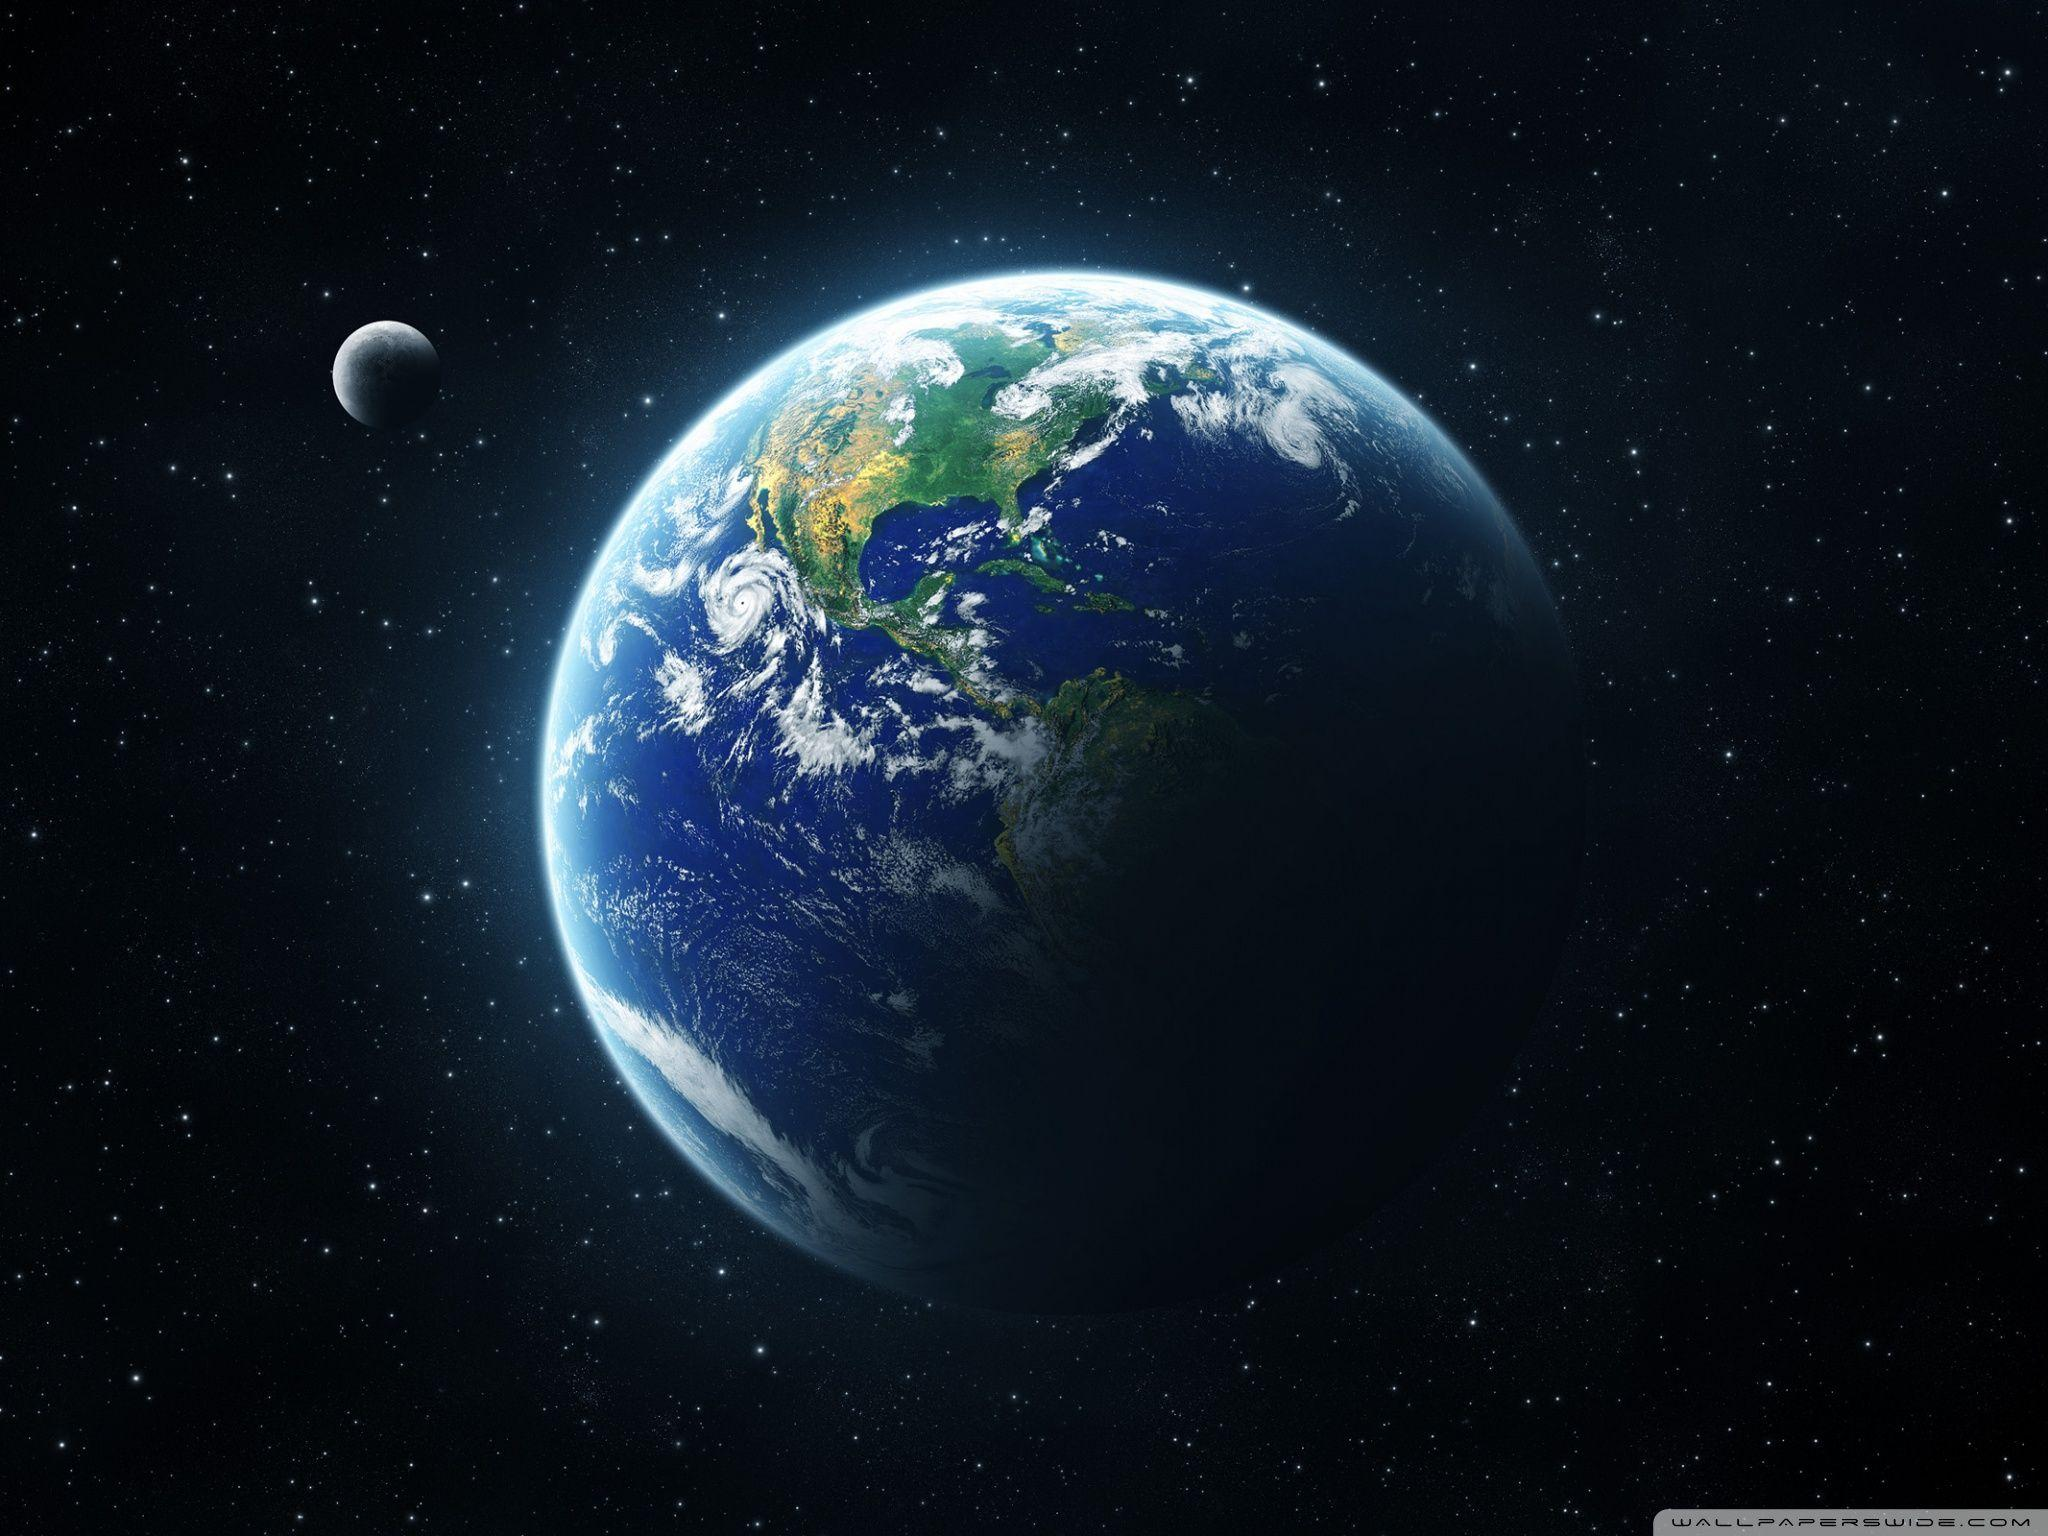 Desktop Backgrounds Hd Earth Wallpaper Cave